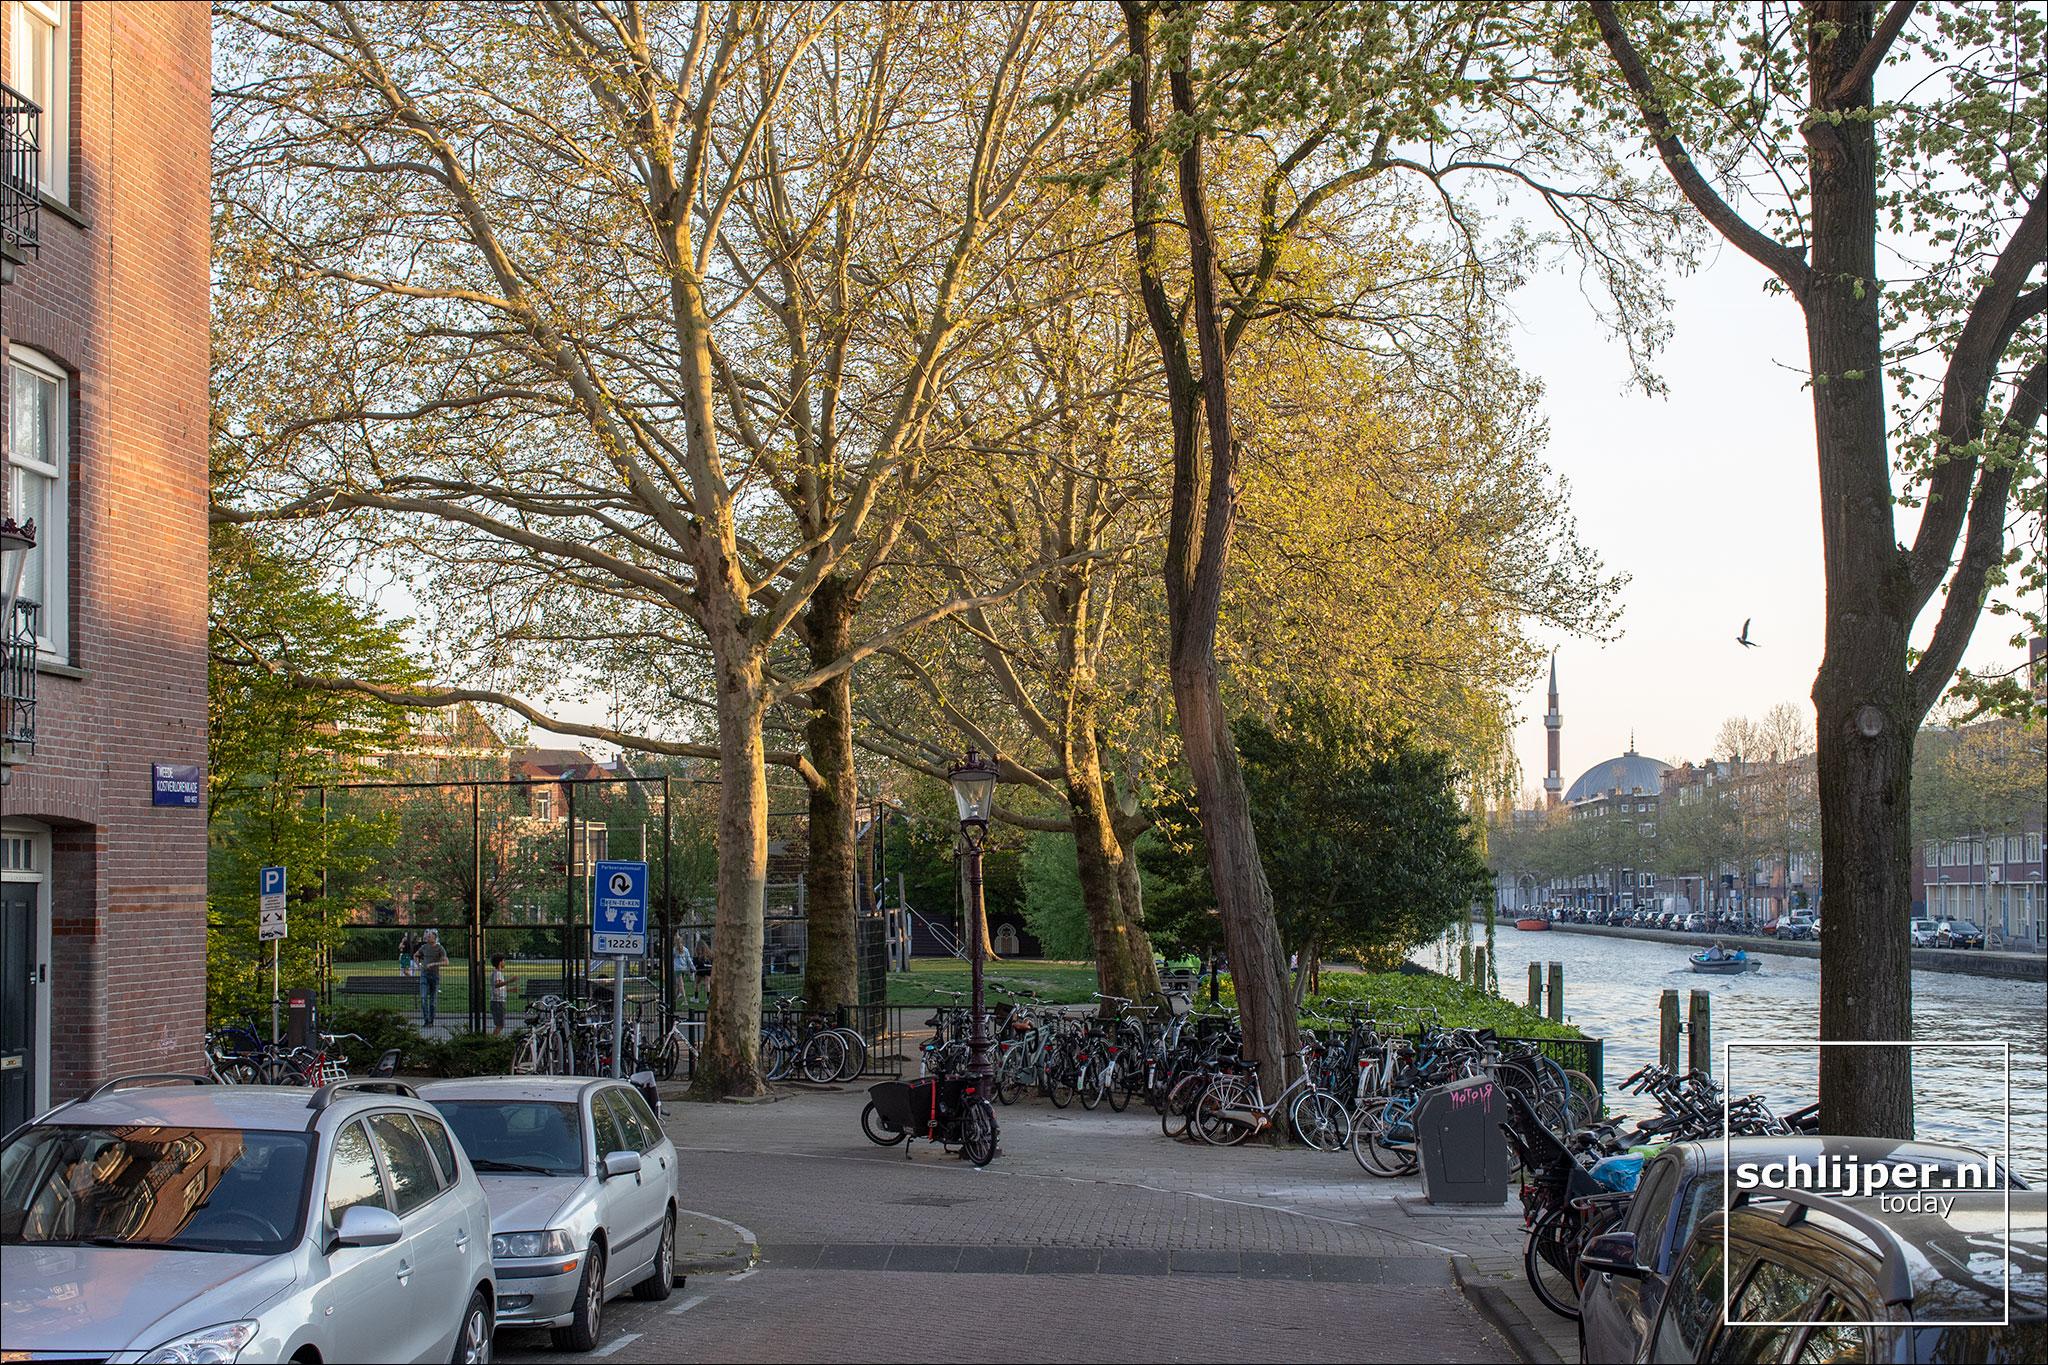 Nederland, Amsterdam, 21 april 2019